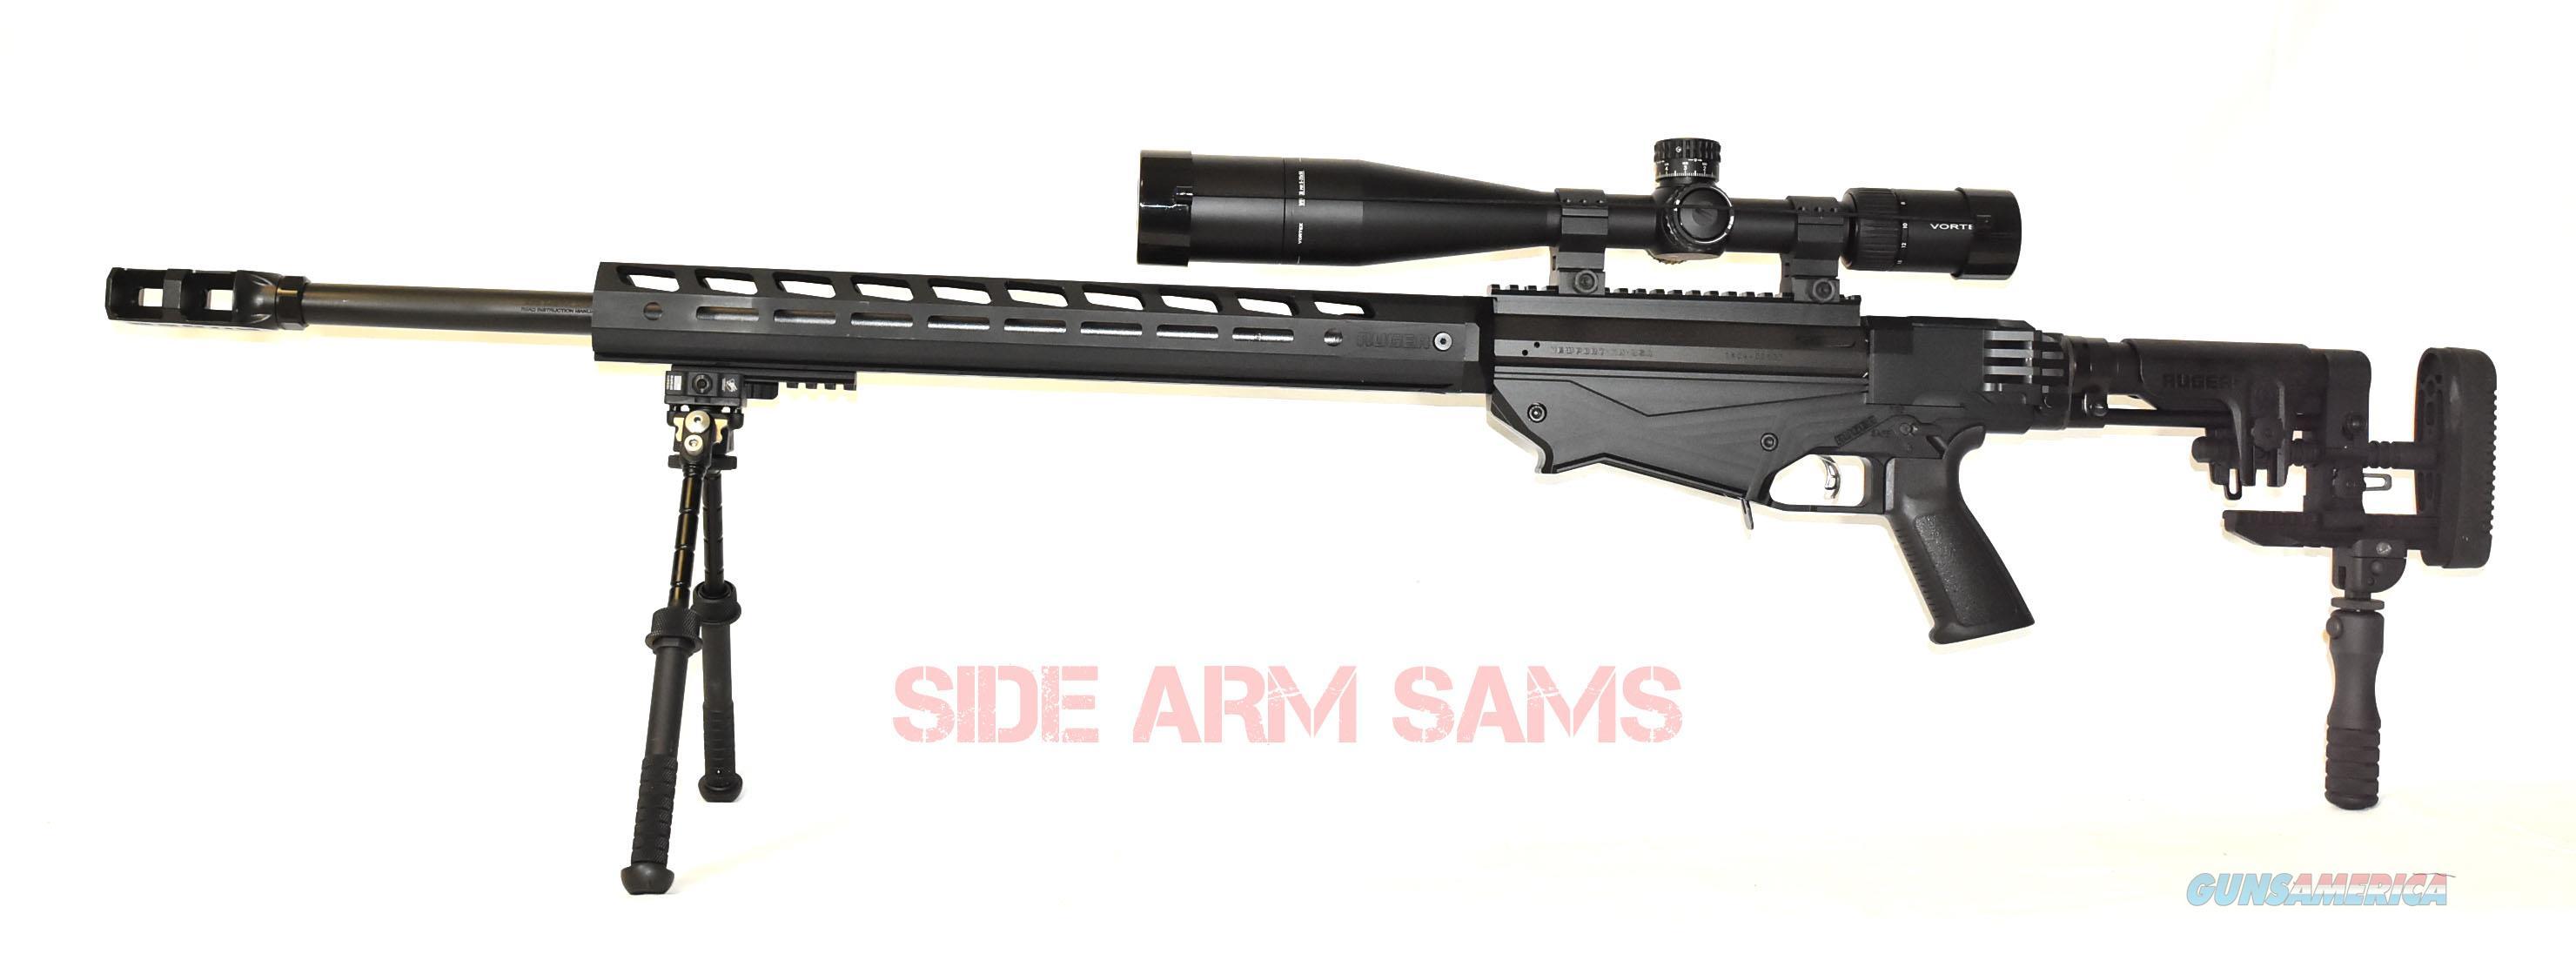 NIB RUGER Precision Rifle System,.338LM, Vortex Viper MRAD, Atlas Bipod/Mono Pod-Black  Guns > Rifles > Ruger Rifles > Precision Rifle Series